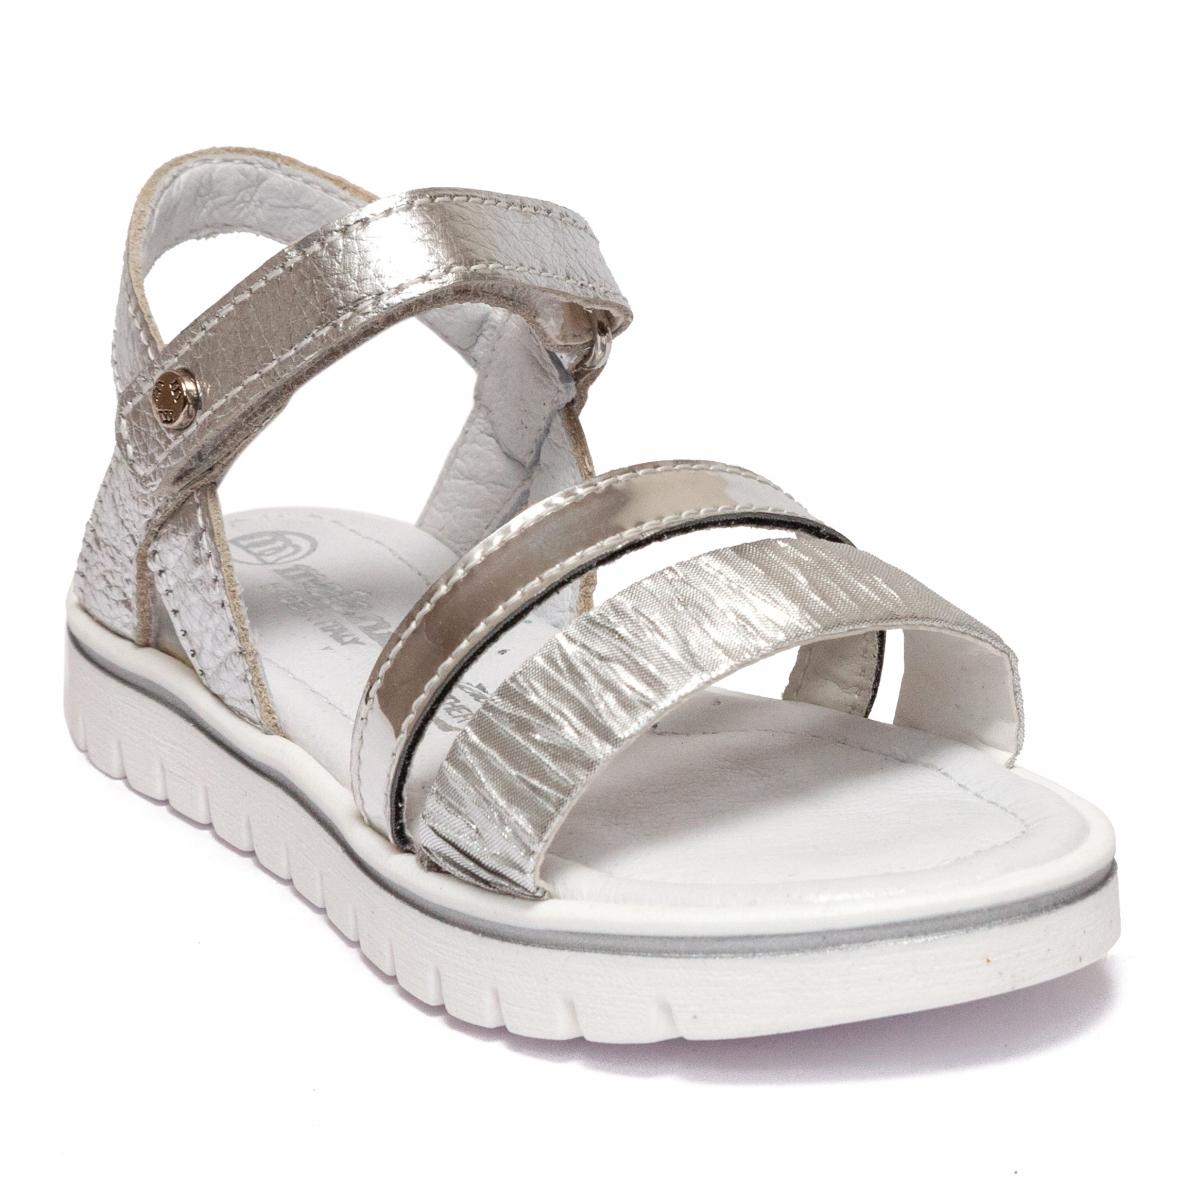 Sandale fete Melania 4121 argintiu 26-38